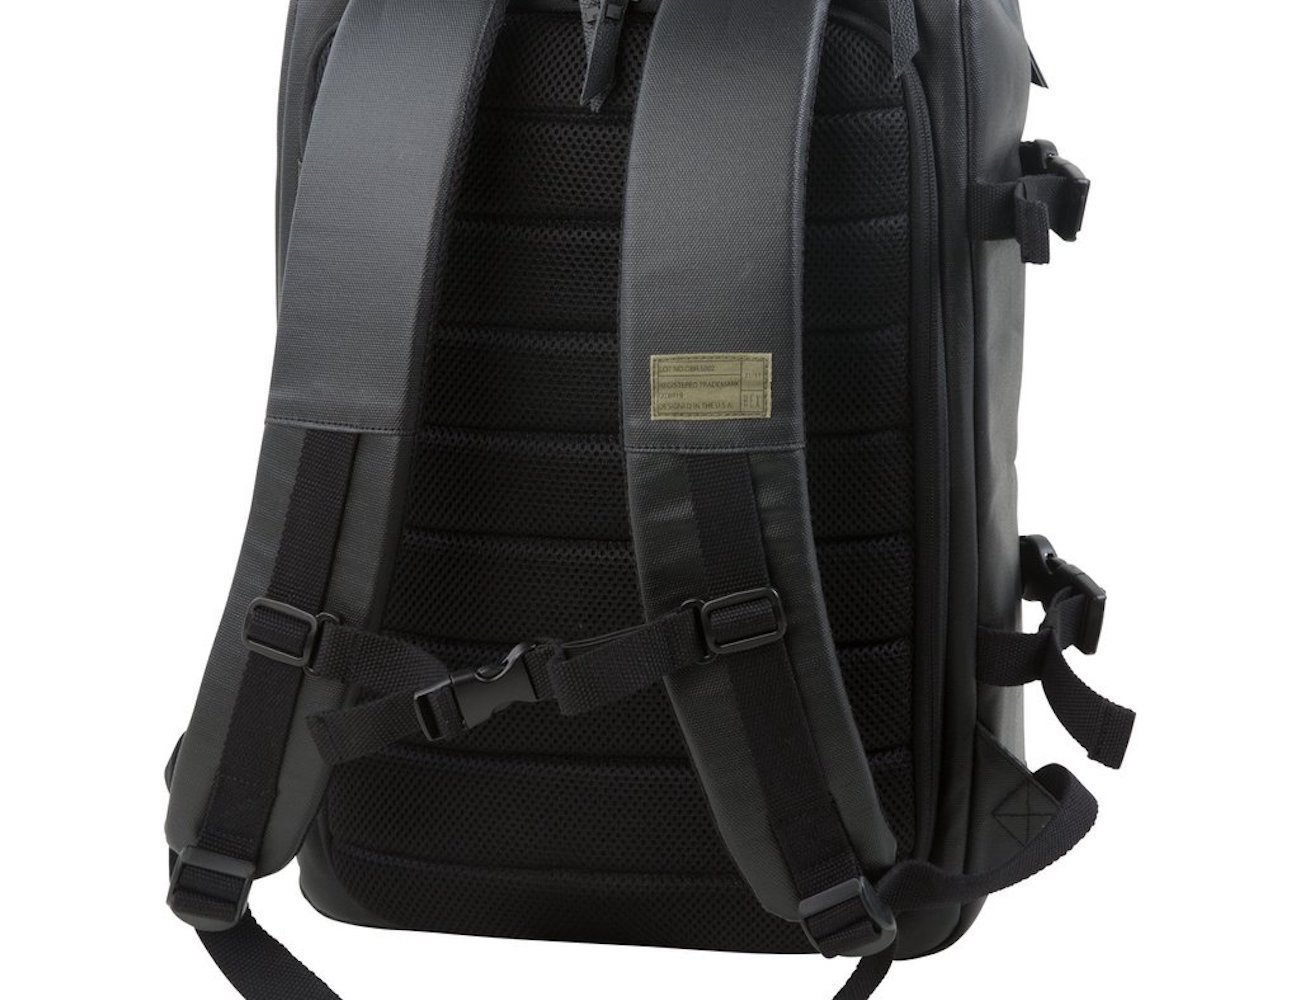 Calibre Medium DSLR Backpack